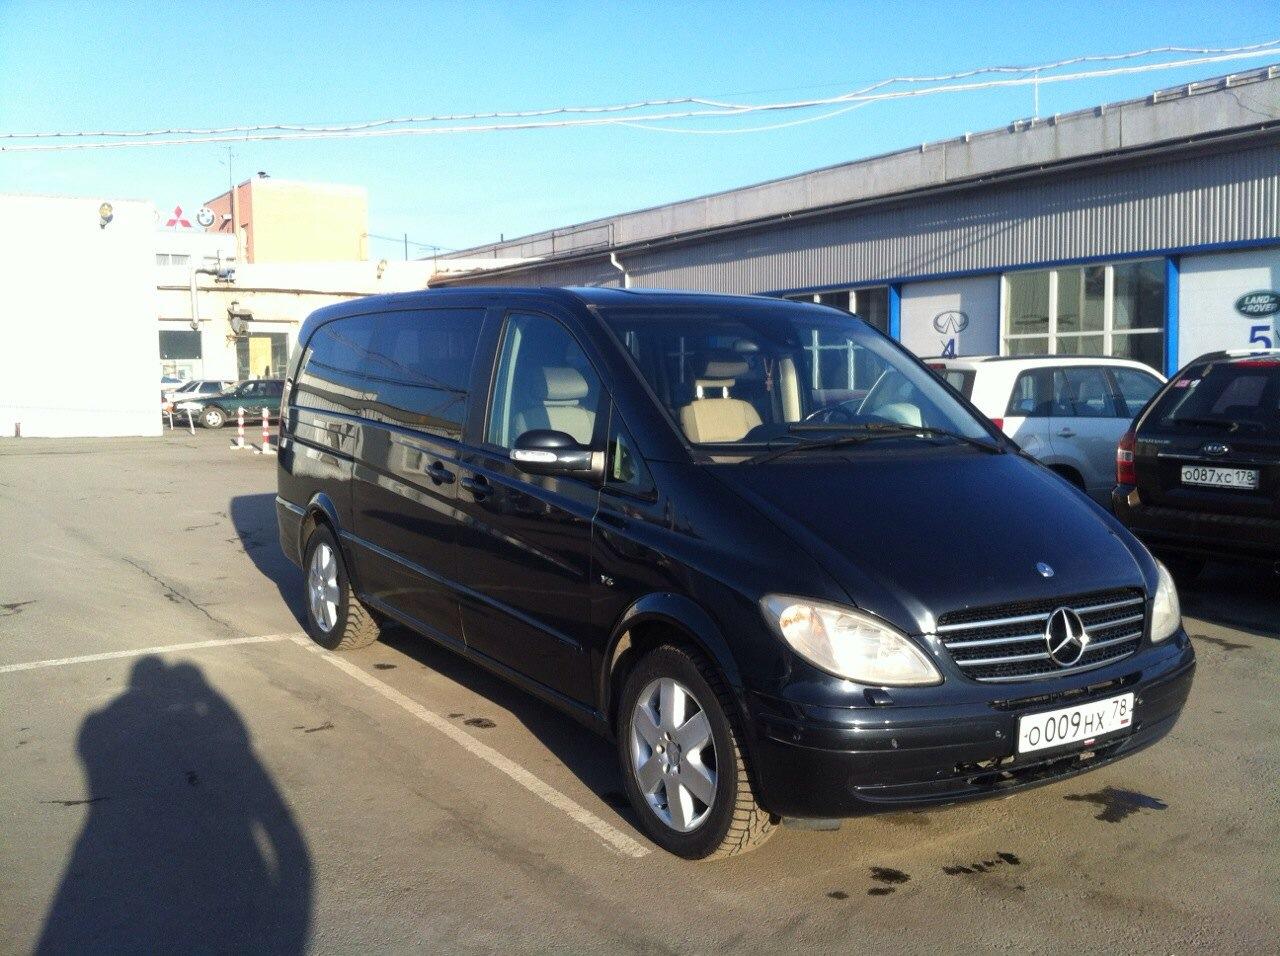 Mercedes-Benz Viano. Вместимость 6 человек.